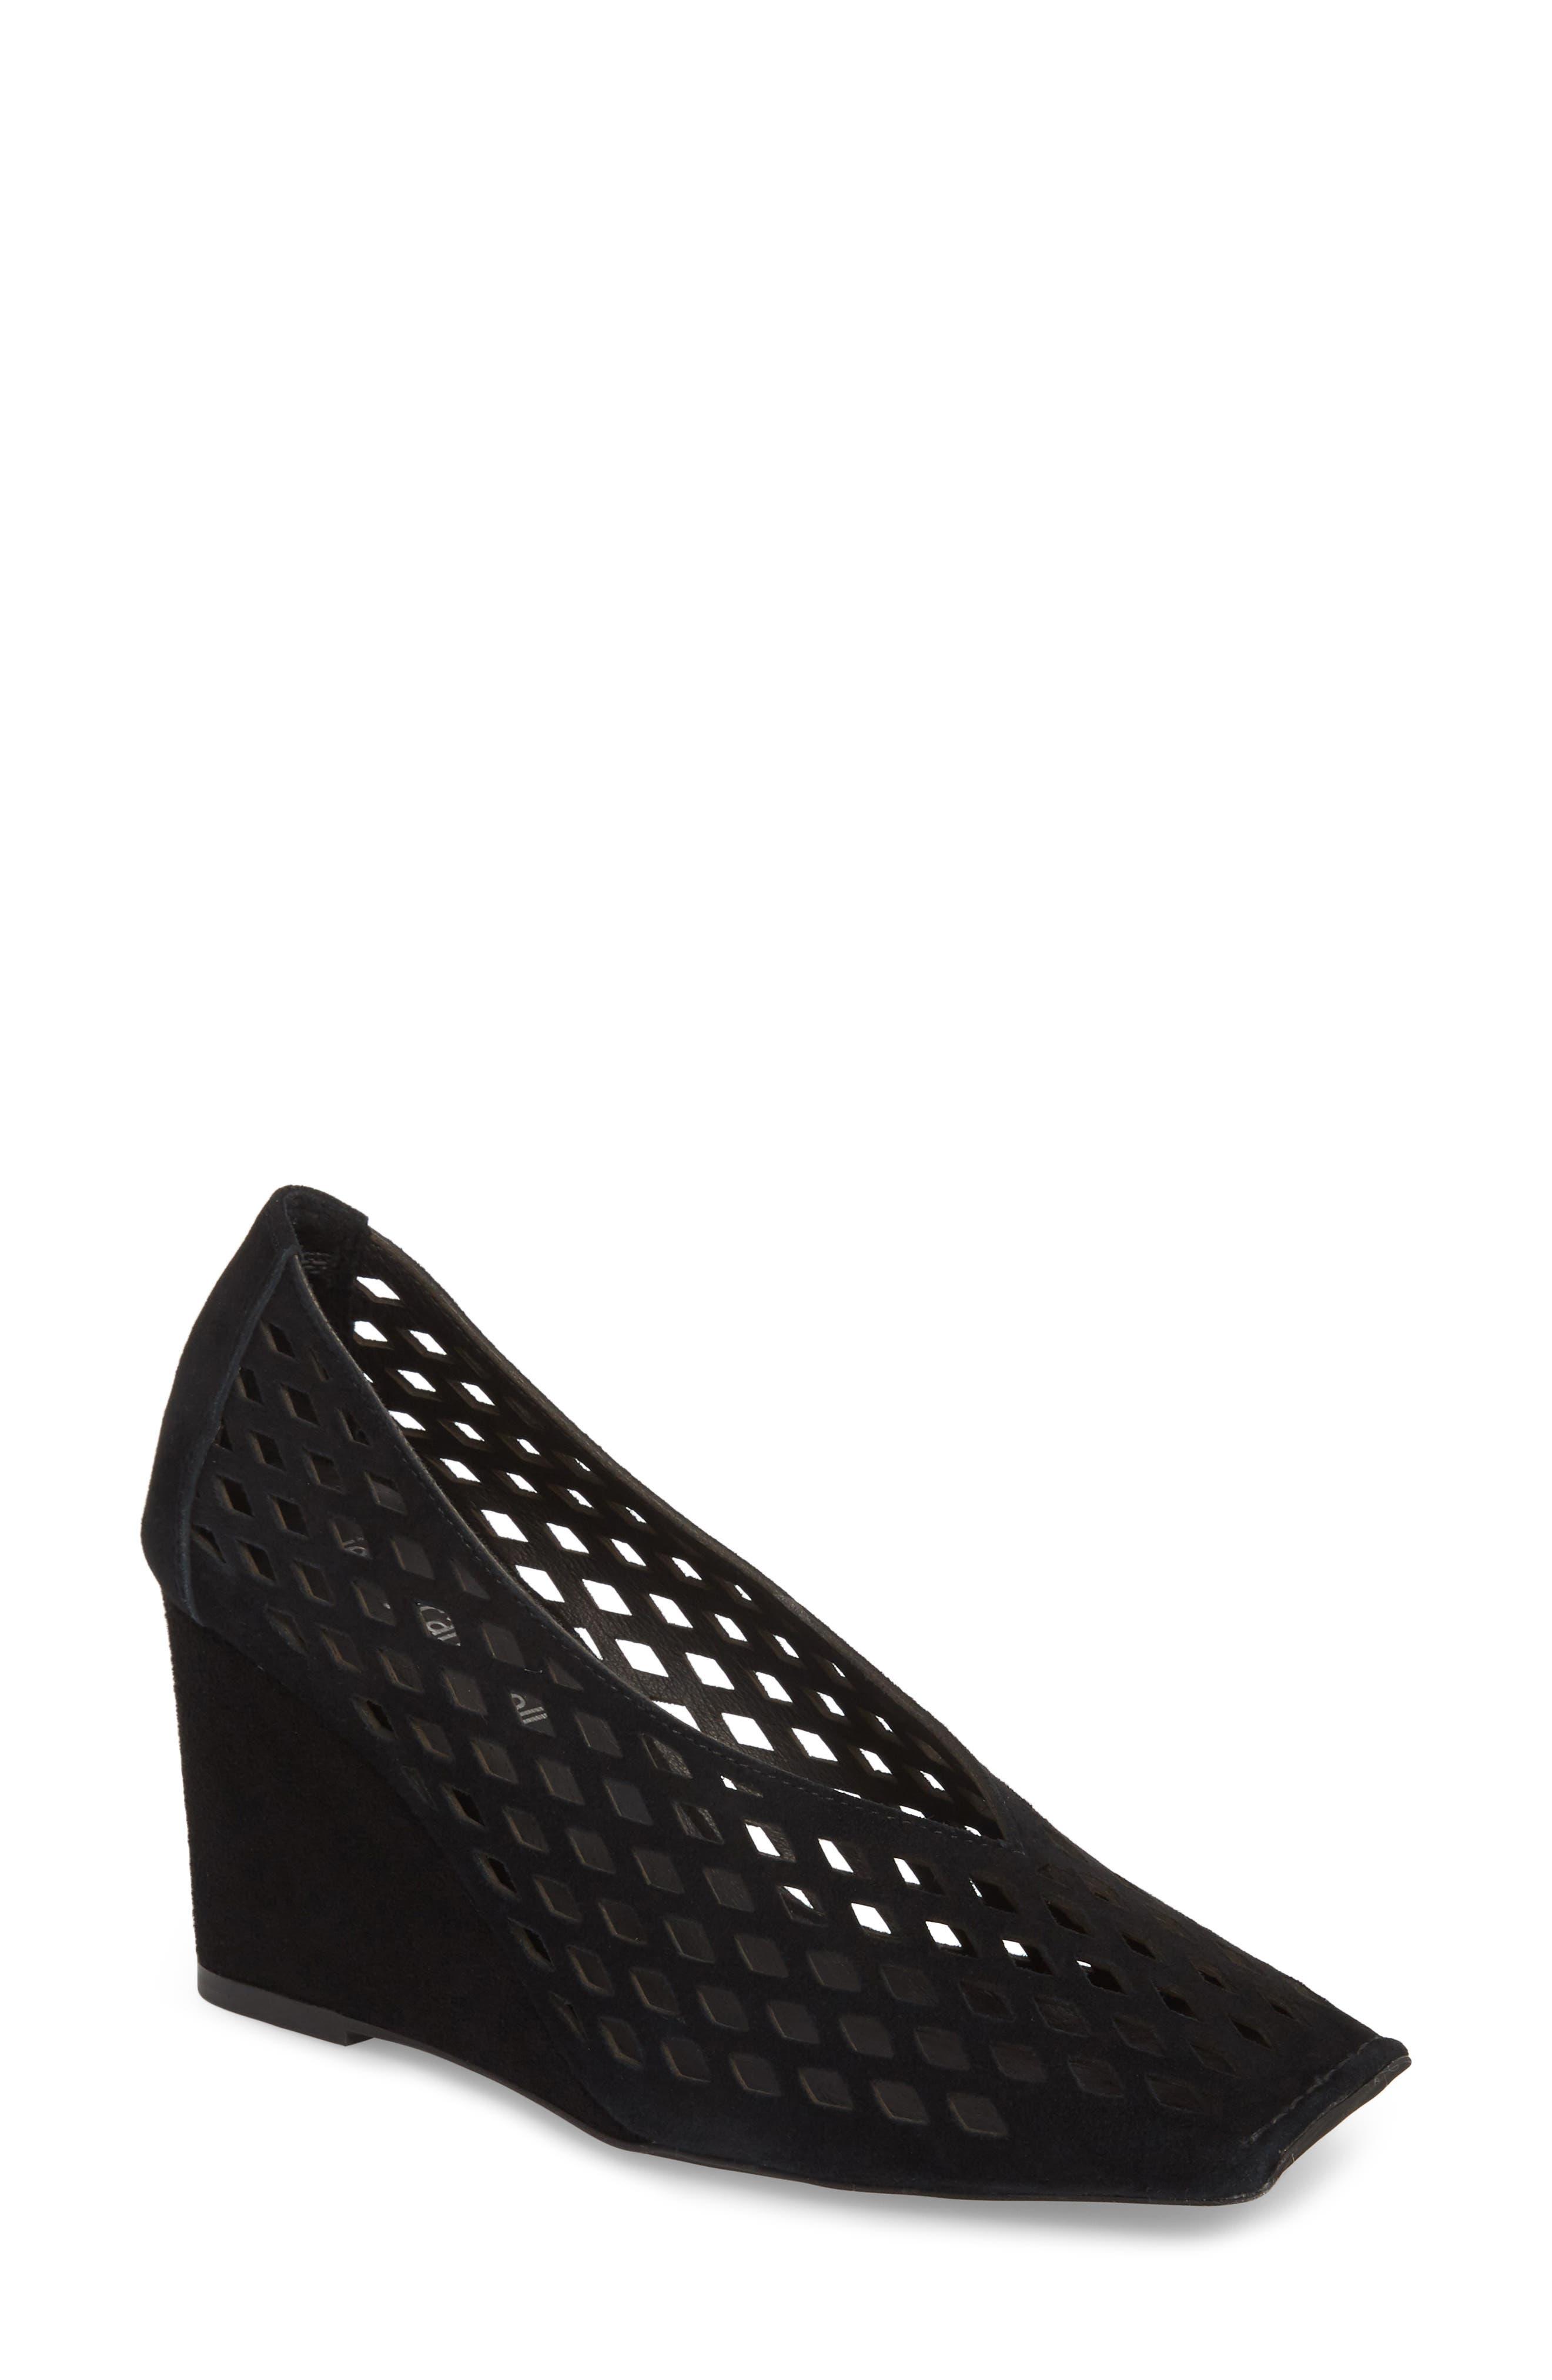 Vanira Perforated Wedge,                         Main,                         color, Black Suede